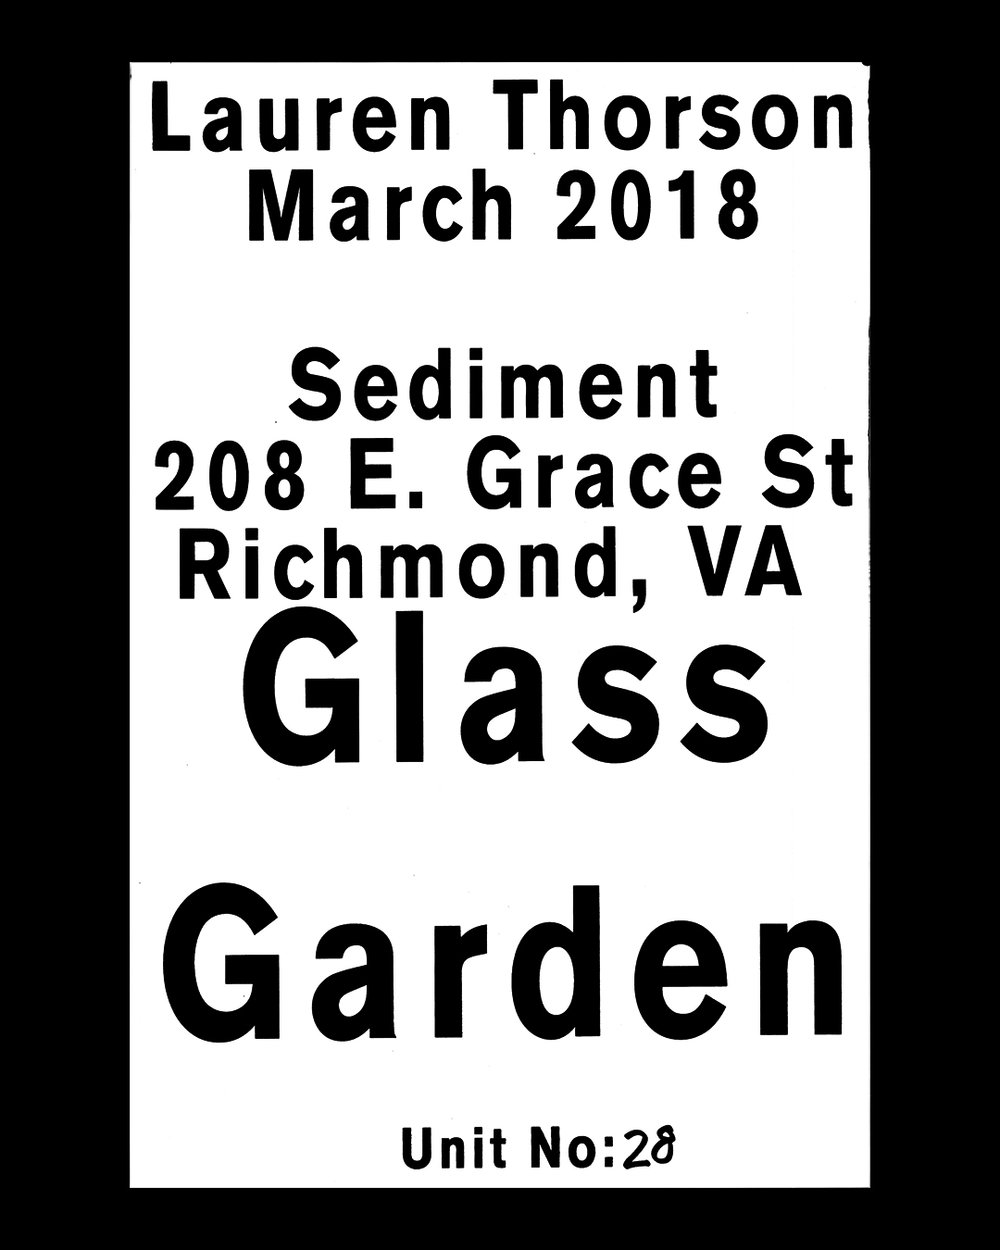 glass_garden_thorson_instagram.jpg